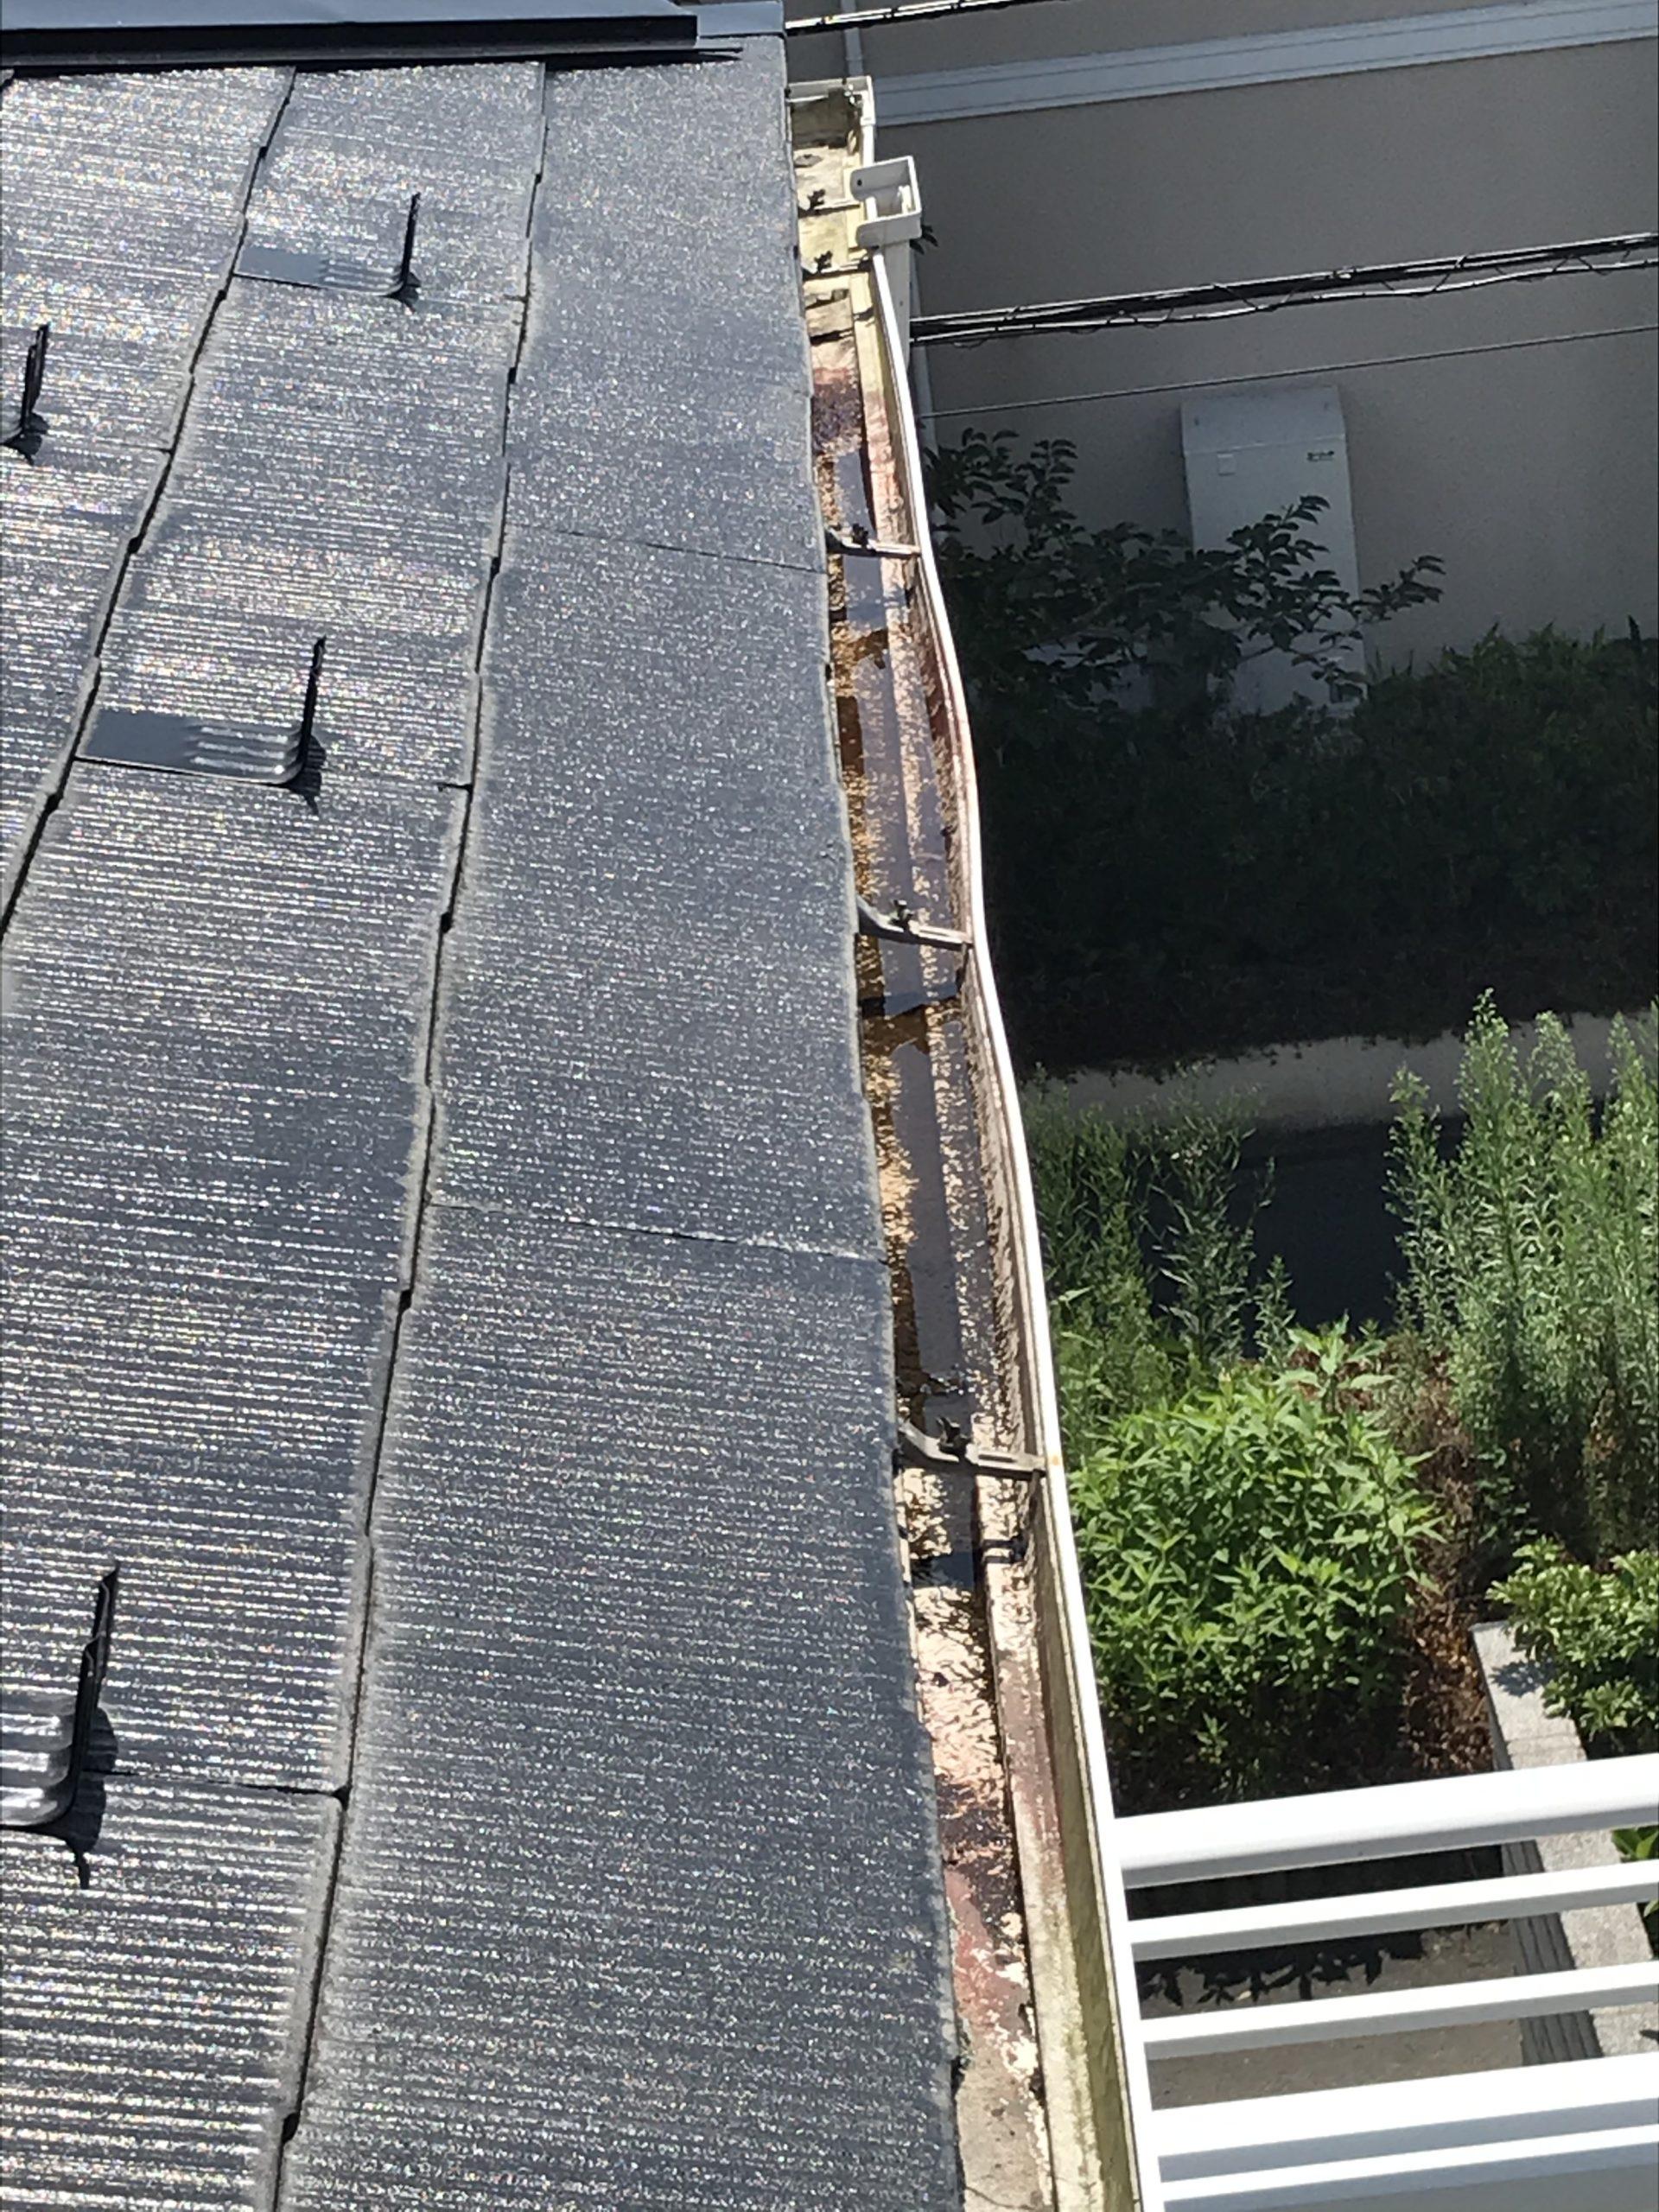 仙台市青葉区の雨樋破損の写真